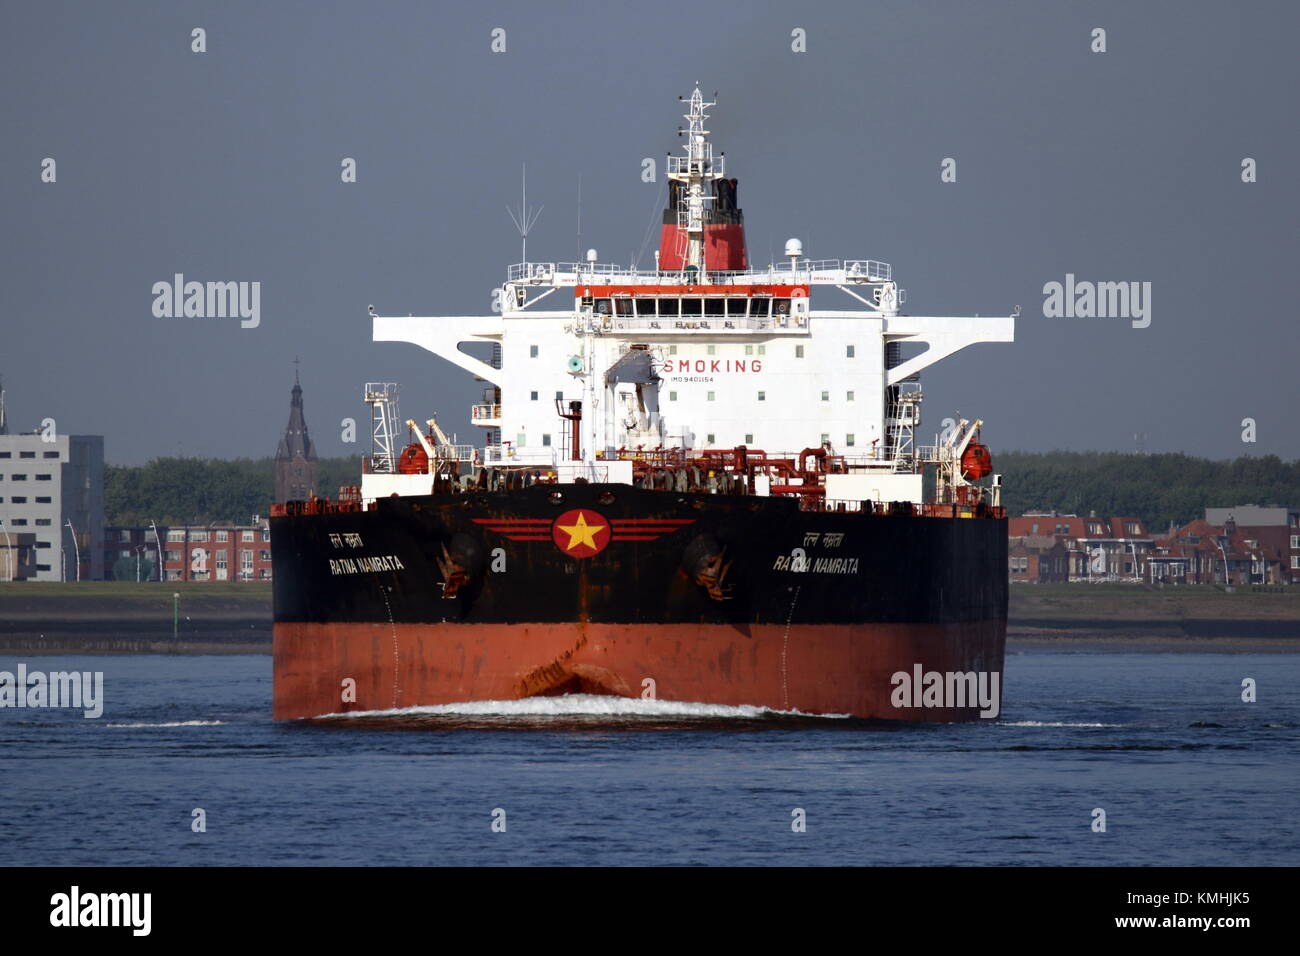 The tanker Ratna Namrata passes on 10 May 2017 Terneuzen on the way to Antwerp. - Stock Image